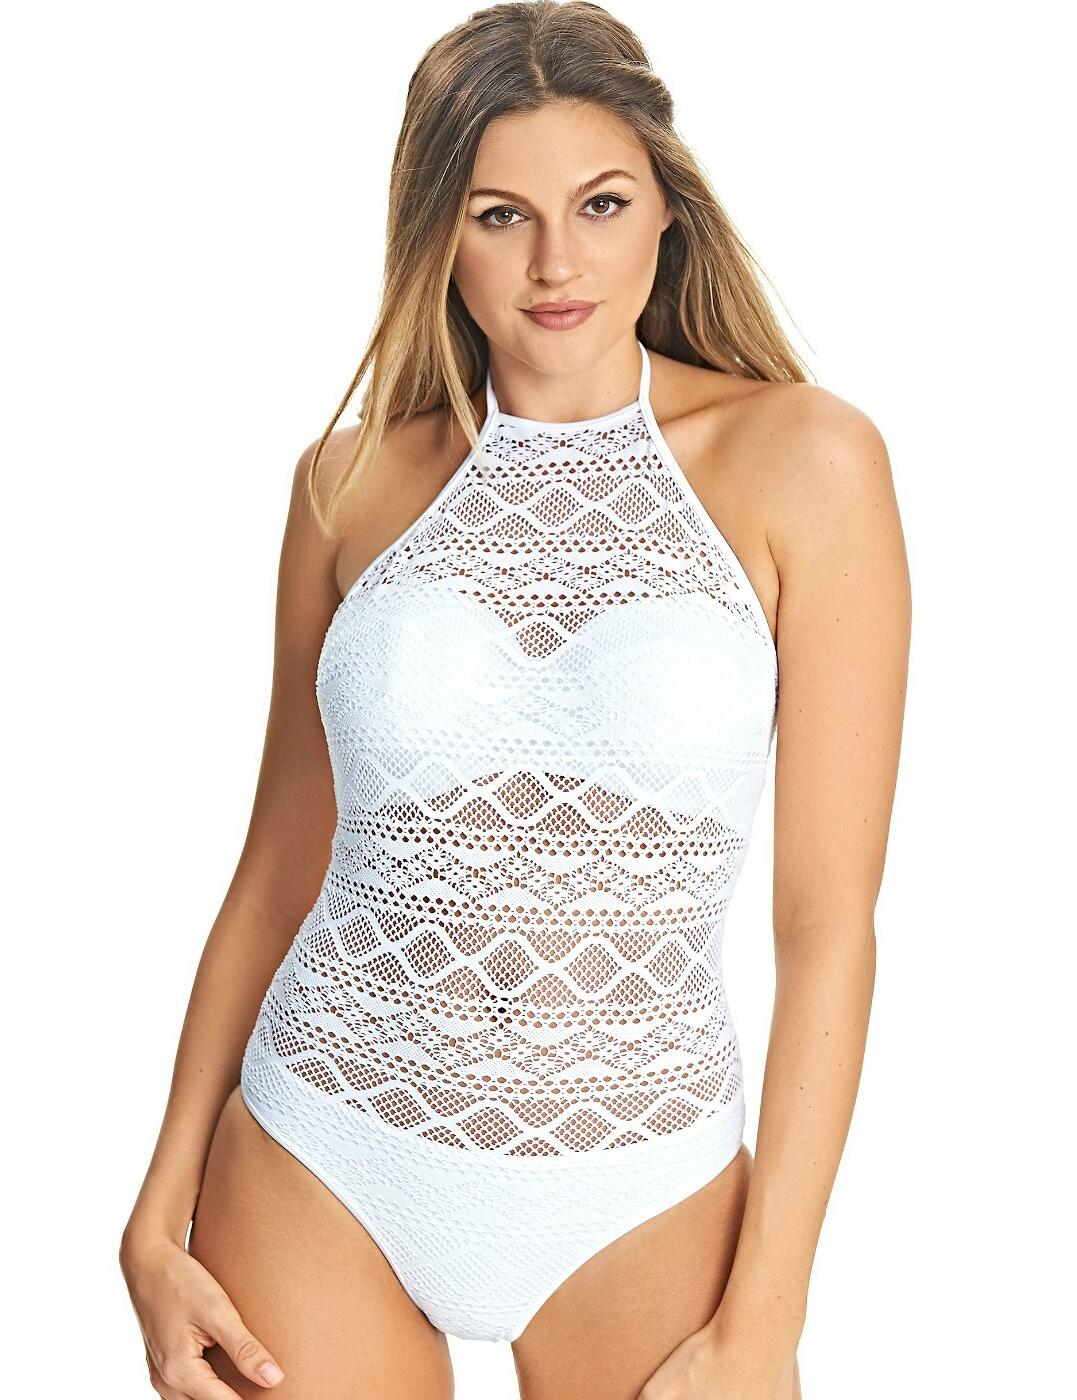 3974 Freya Sundance Underwired High Neck Swimsuit - 3974 White